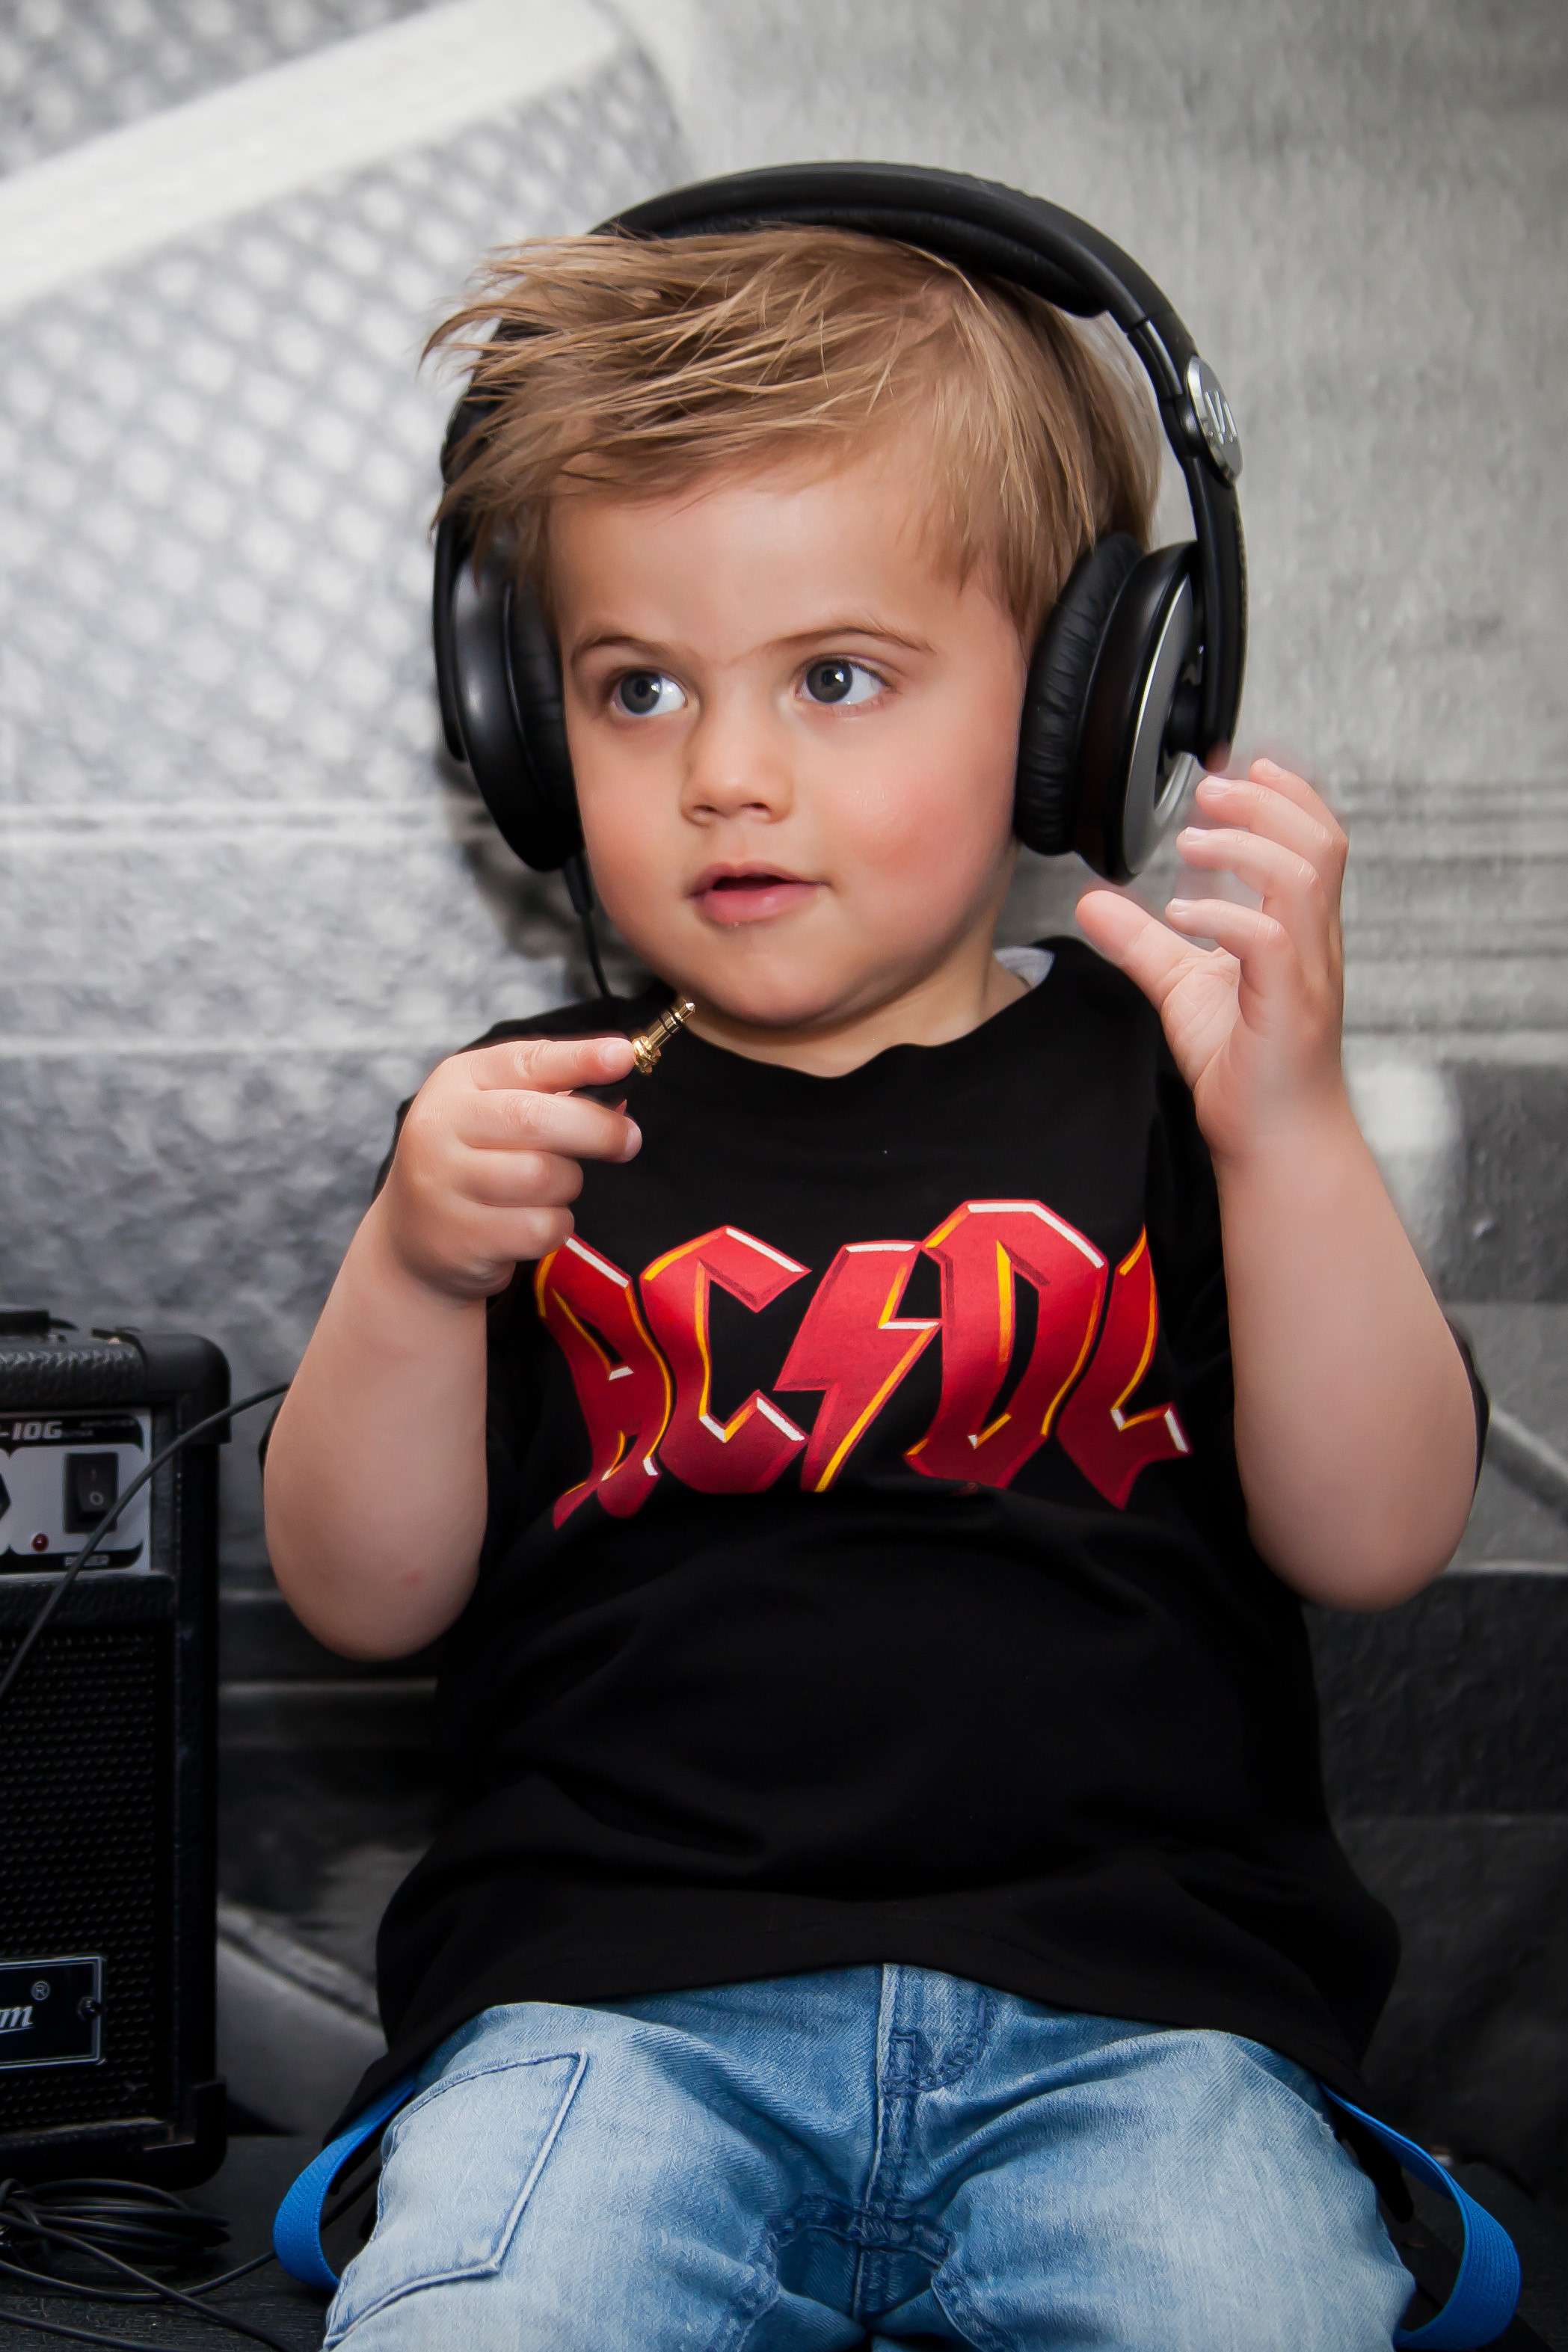 AC/DC baby Shirt gekleurd logo photoshoot foto